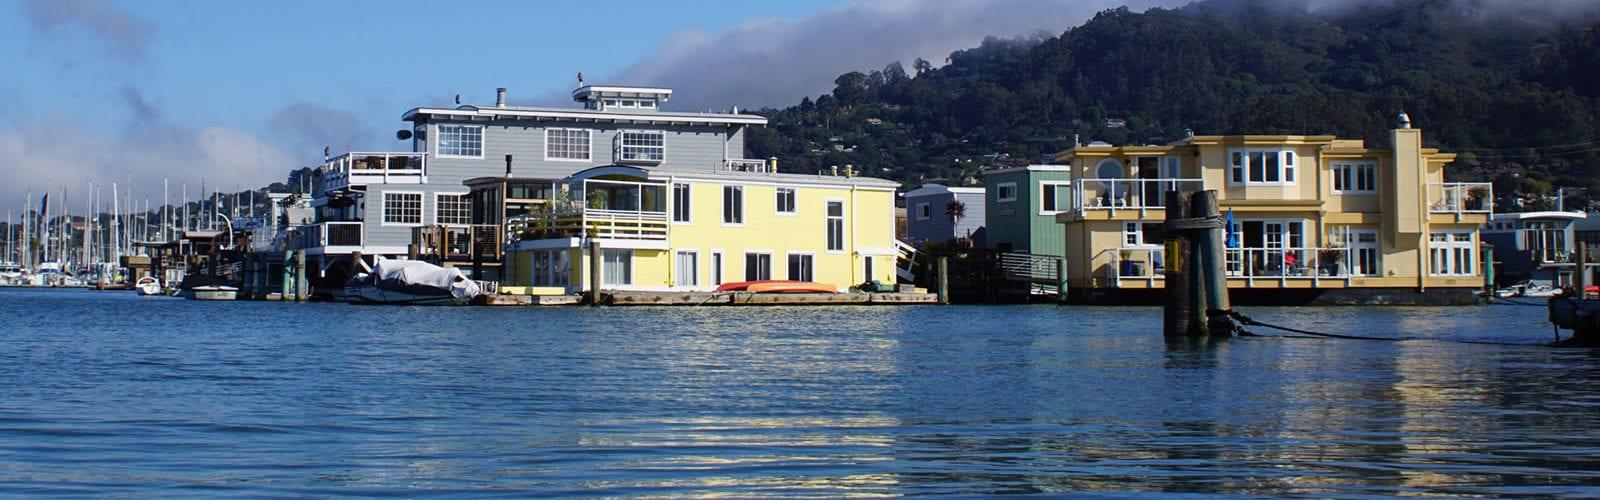 houseboat-sausalito-maison-eau-une